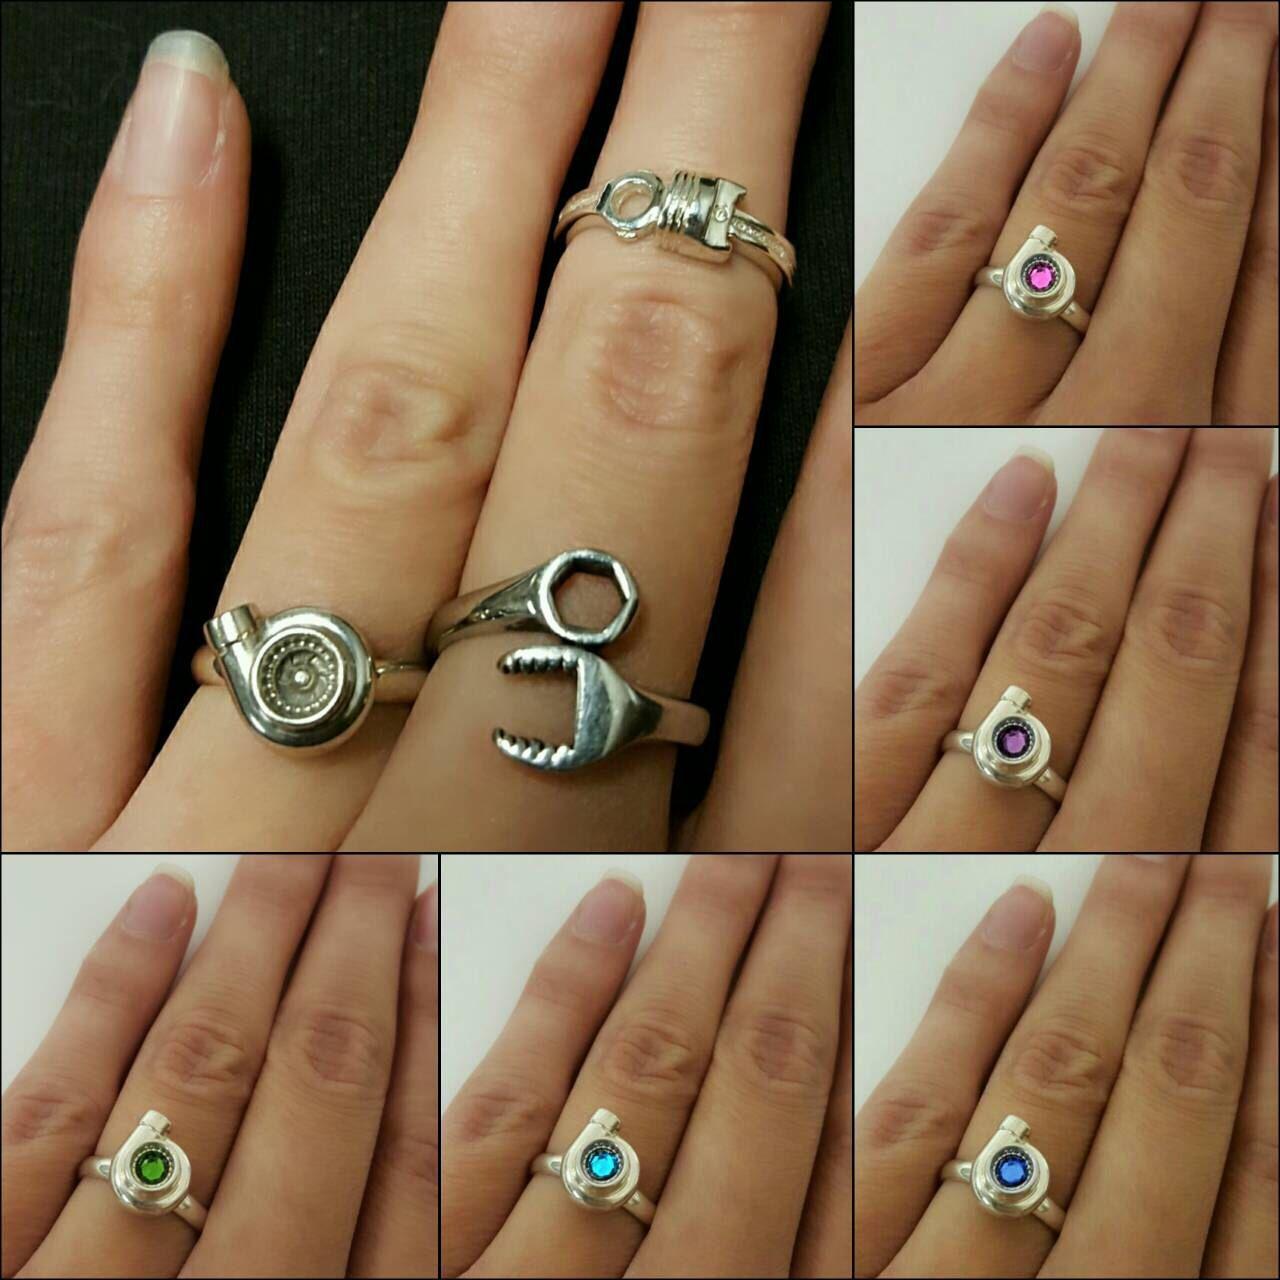 Turbo Ring Or Piston Turbocharger Boost Drift Car Girl Racing Automotive Jewelry By GarageGirlsJewelry On